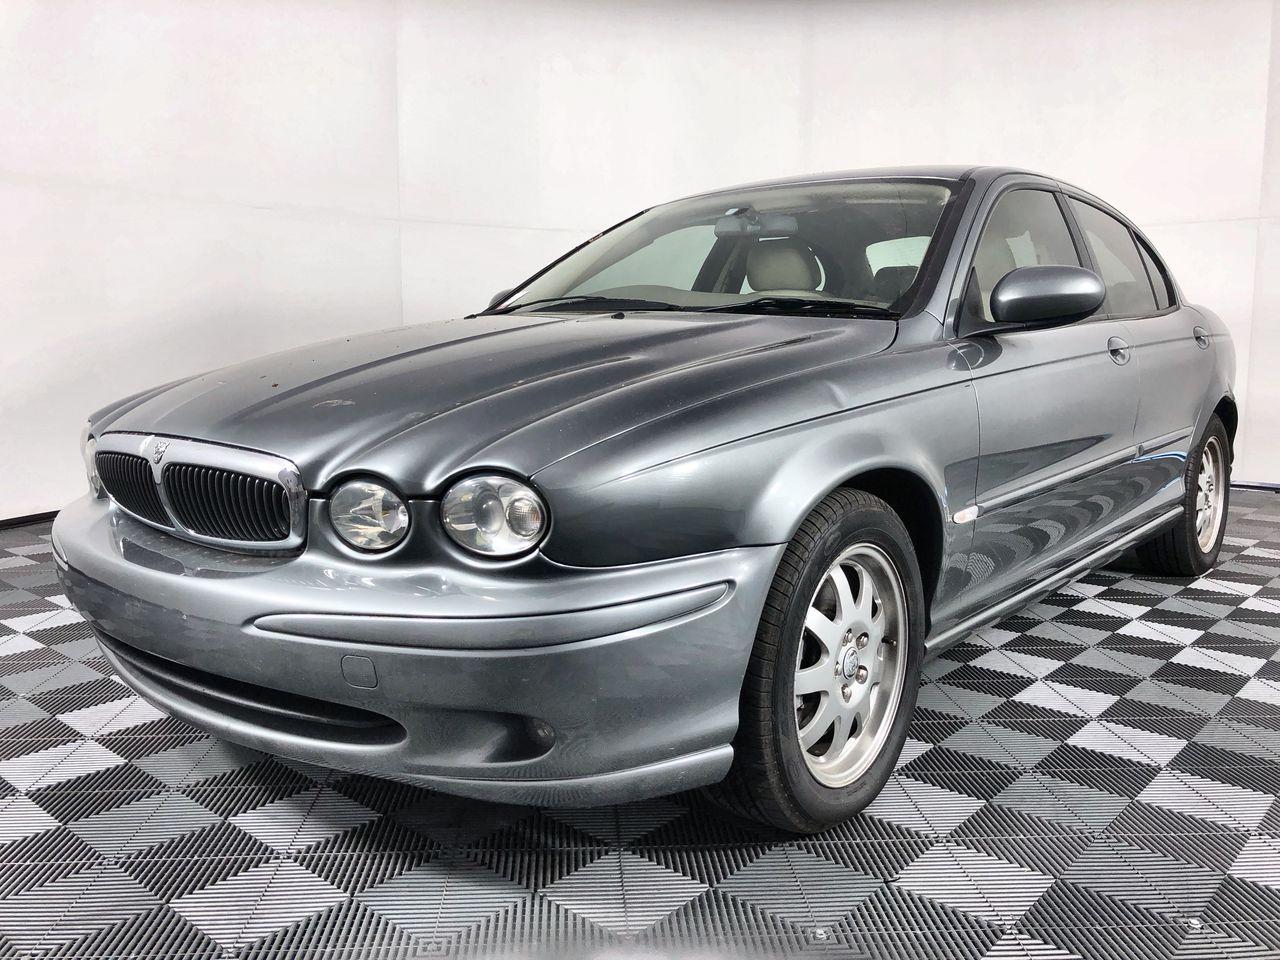 2003 Jaguar X Type 2.1 SE X400 Automatic Sedan